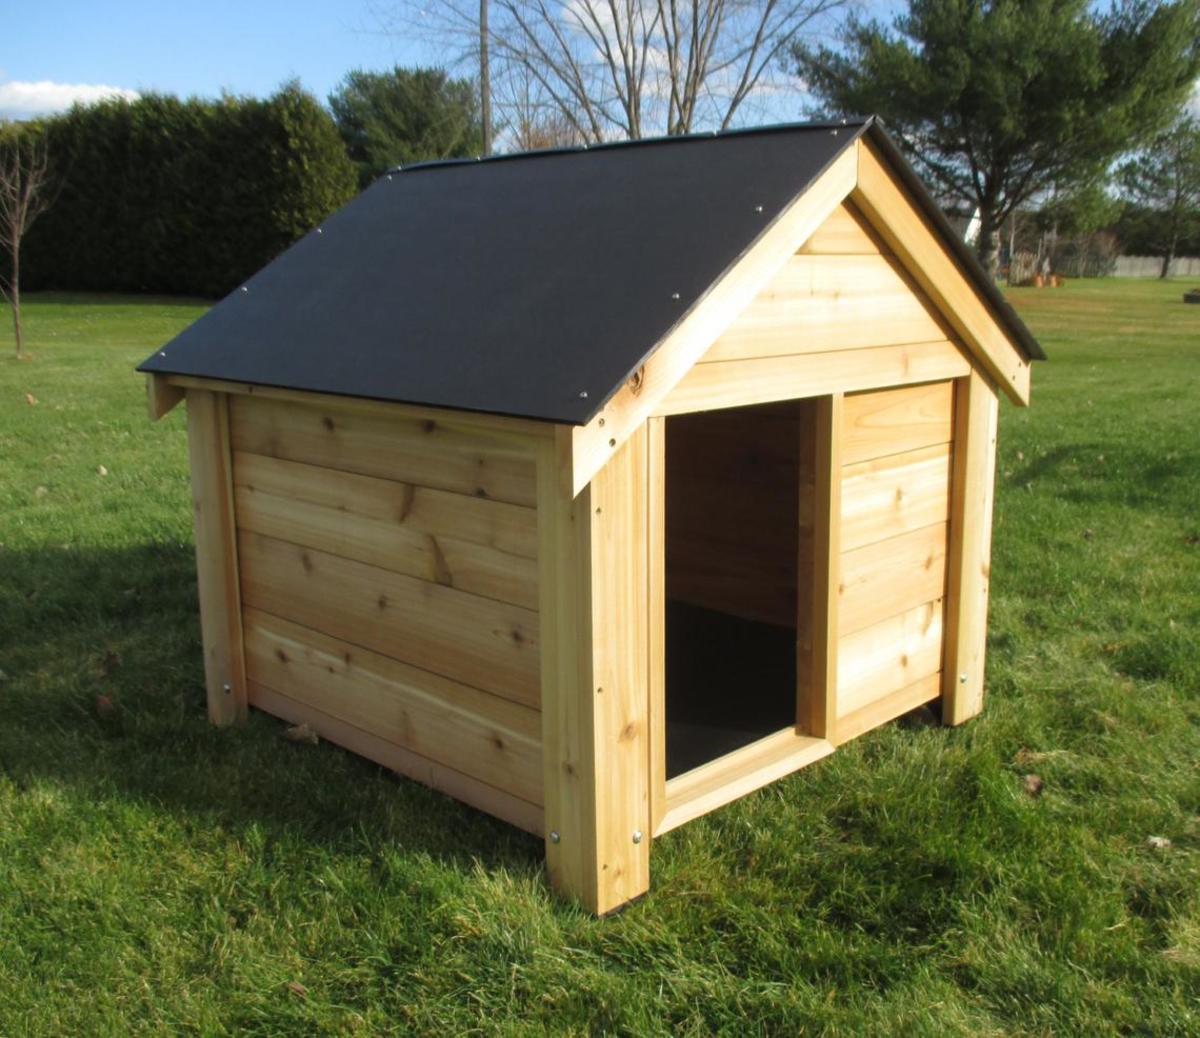 a-diy-dog-house-kit